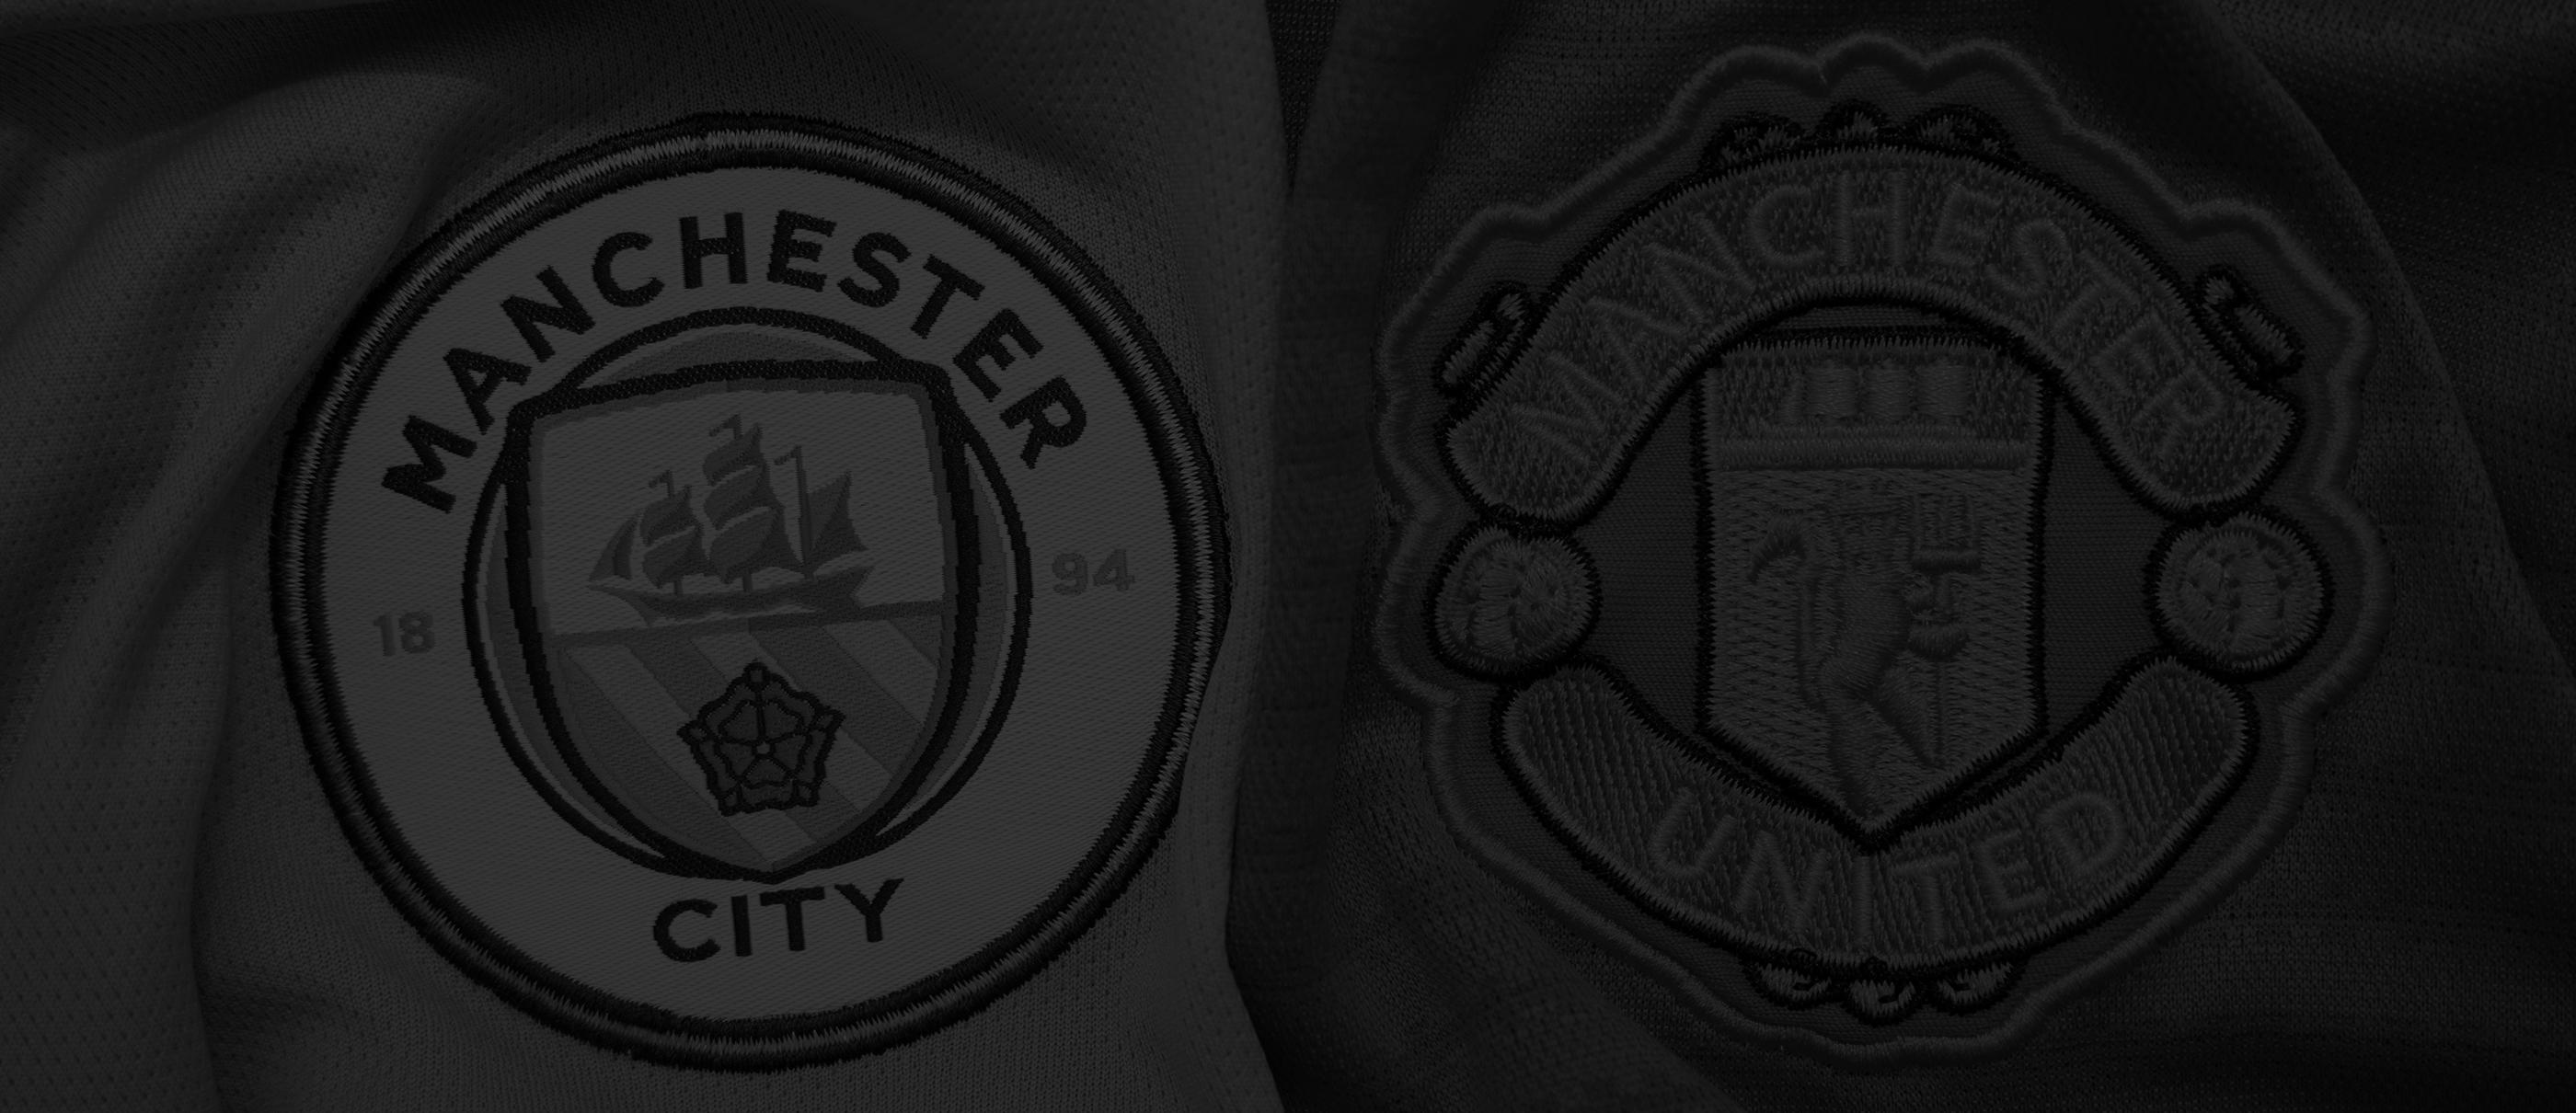 Kaleida: The Manchester Derby; Battle Of The Tech? Banner